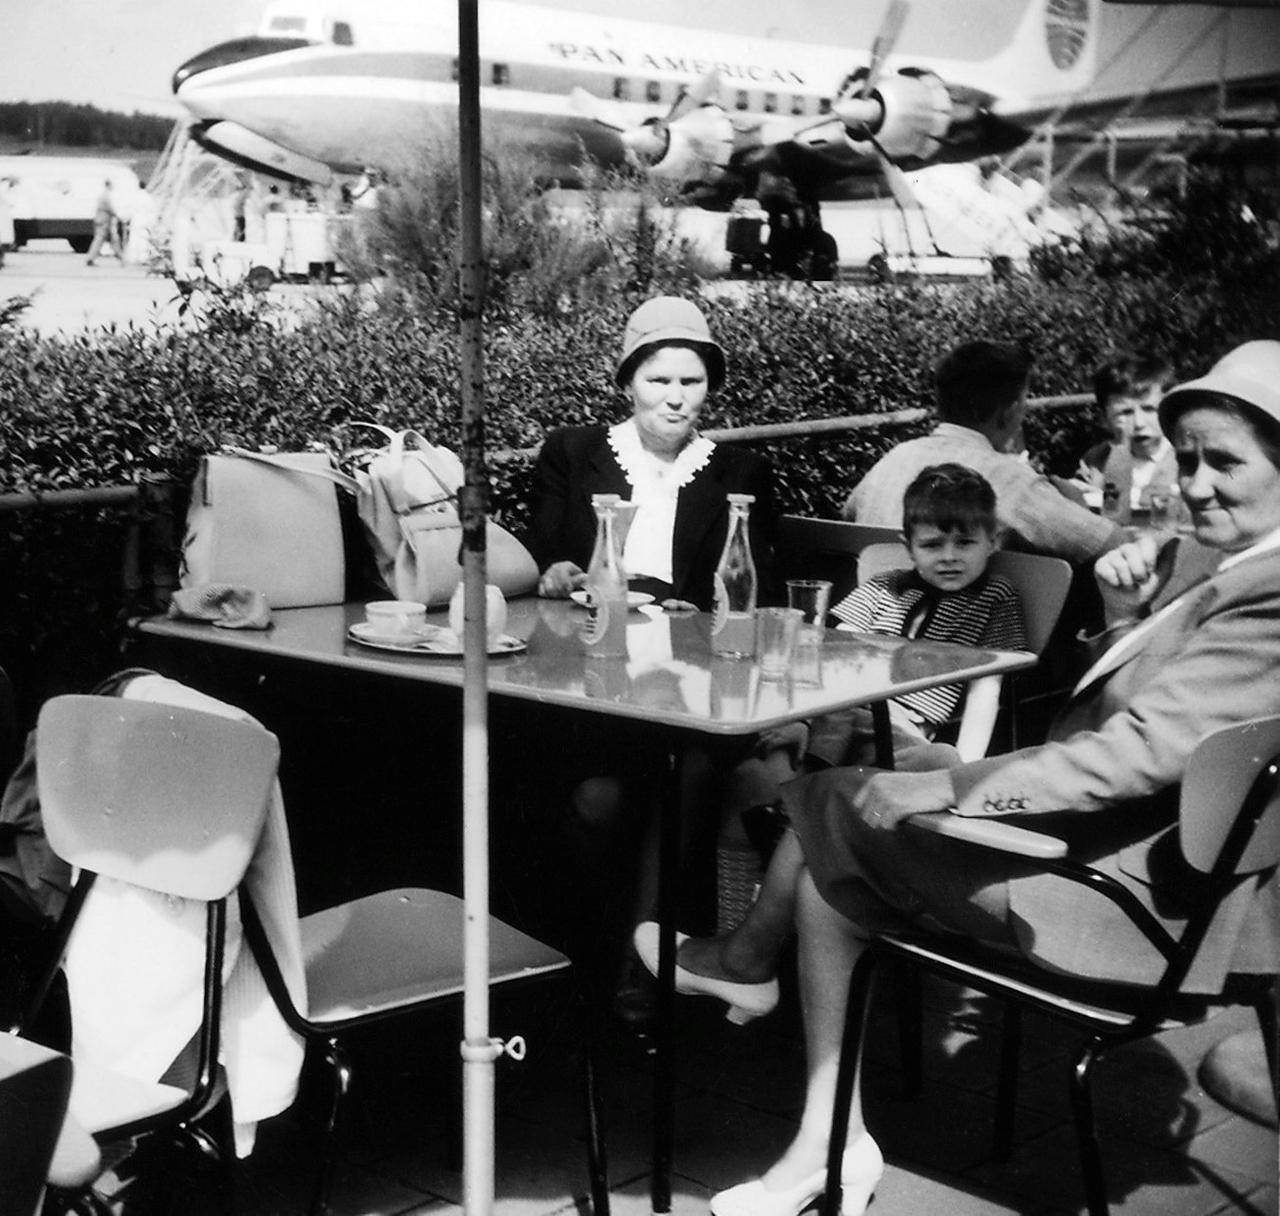 Gößweins Familie am Nürnberger Flughafen im Sommer 1961.